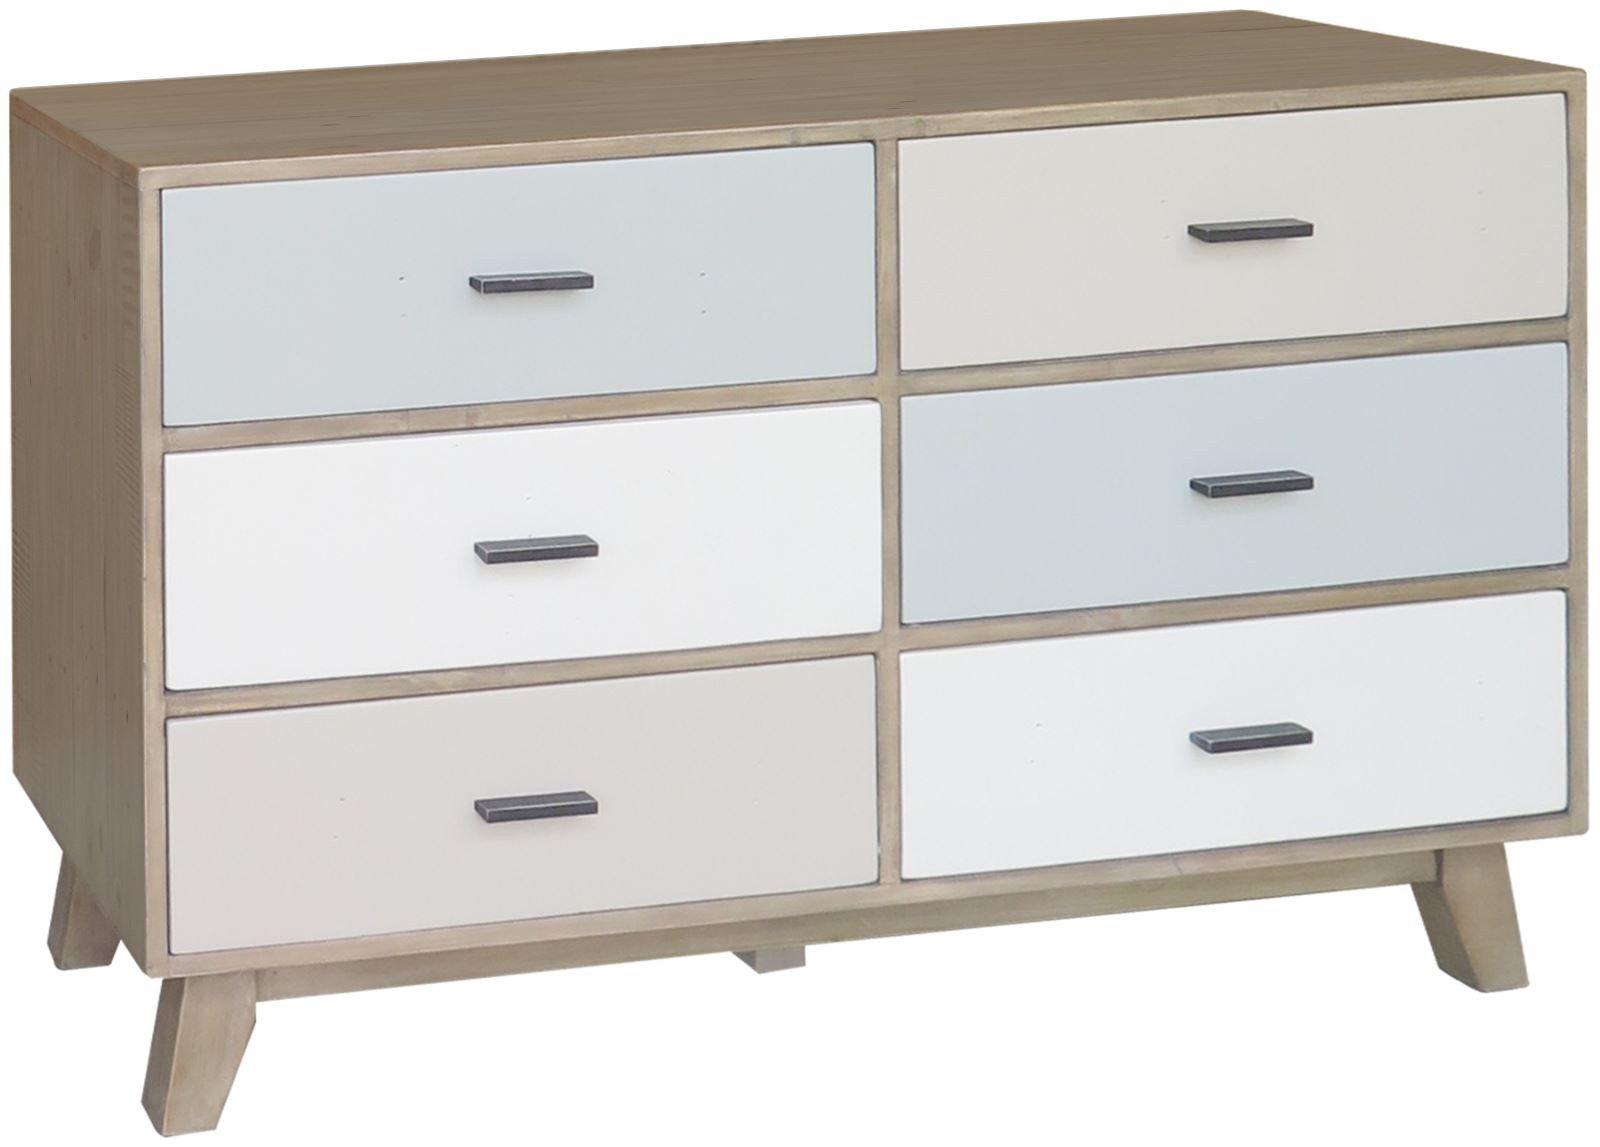 Benoist Reclaimed Wood Vanity Mirror: Sorrento Reclaimed 6 Drawer Wide Chest